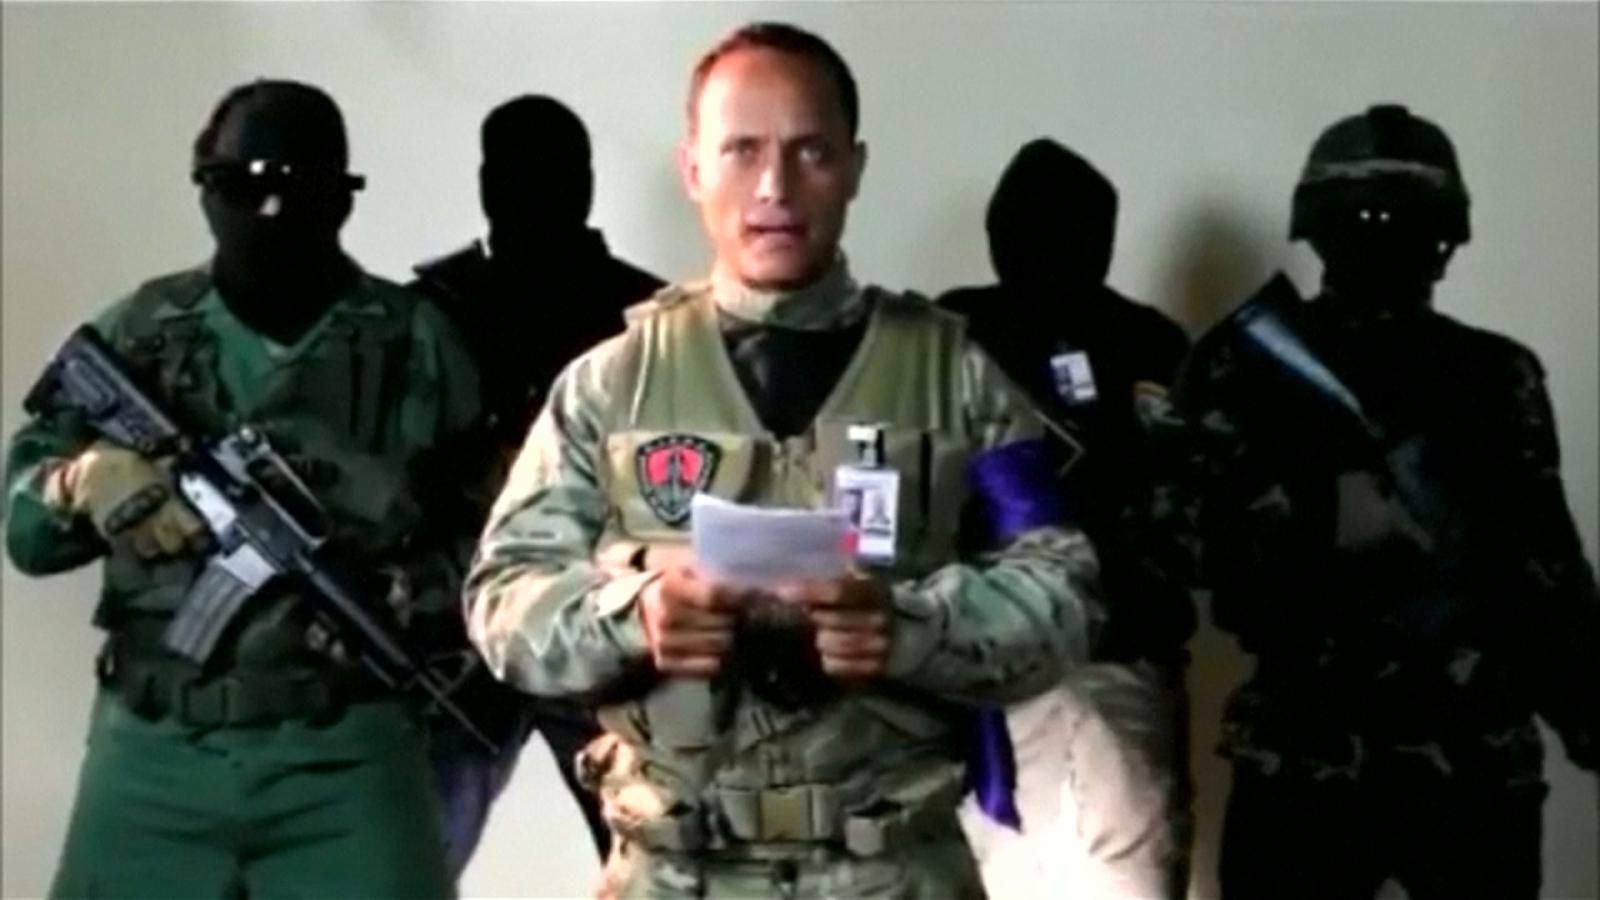 Helicopter attacks Venezuela's pro-Maduro supreme court